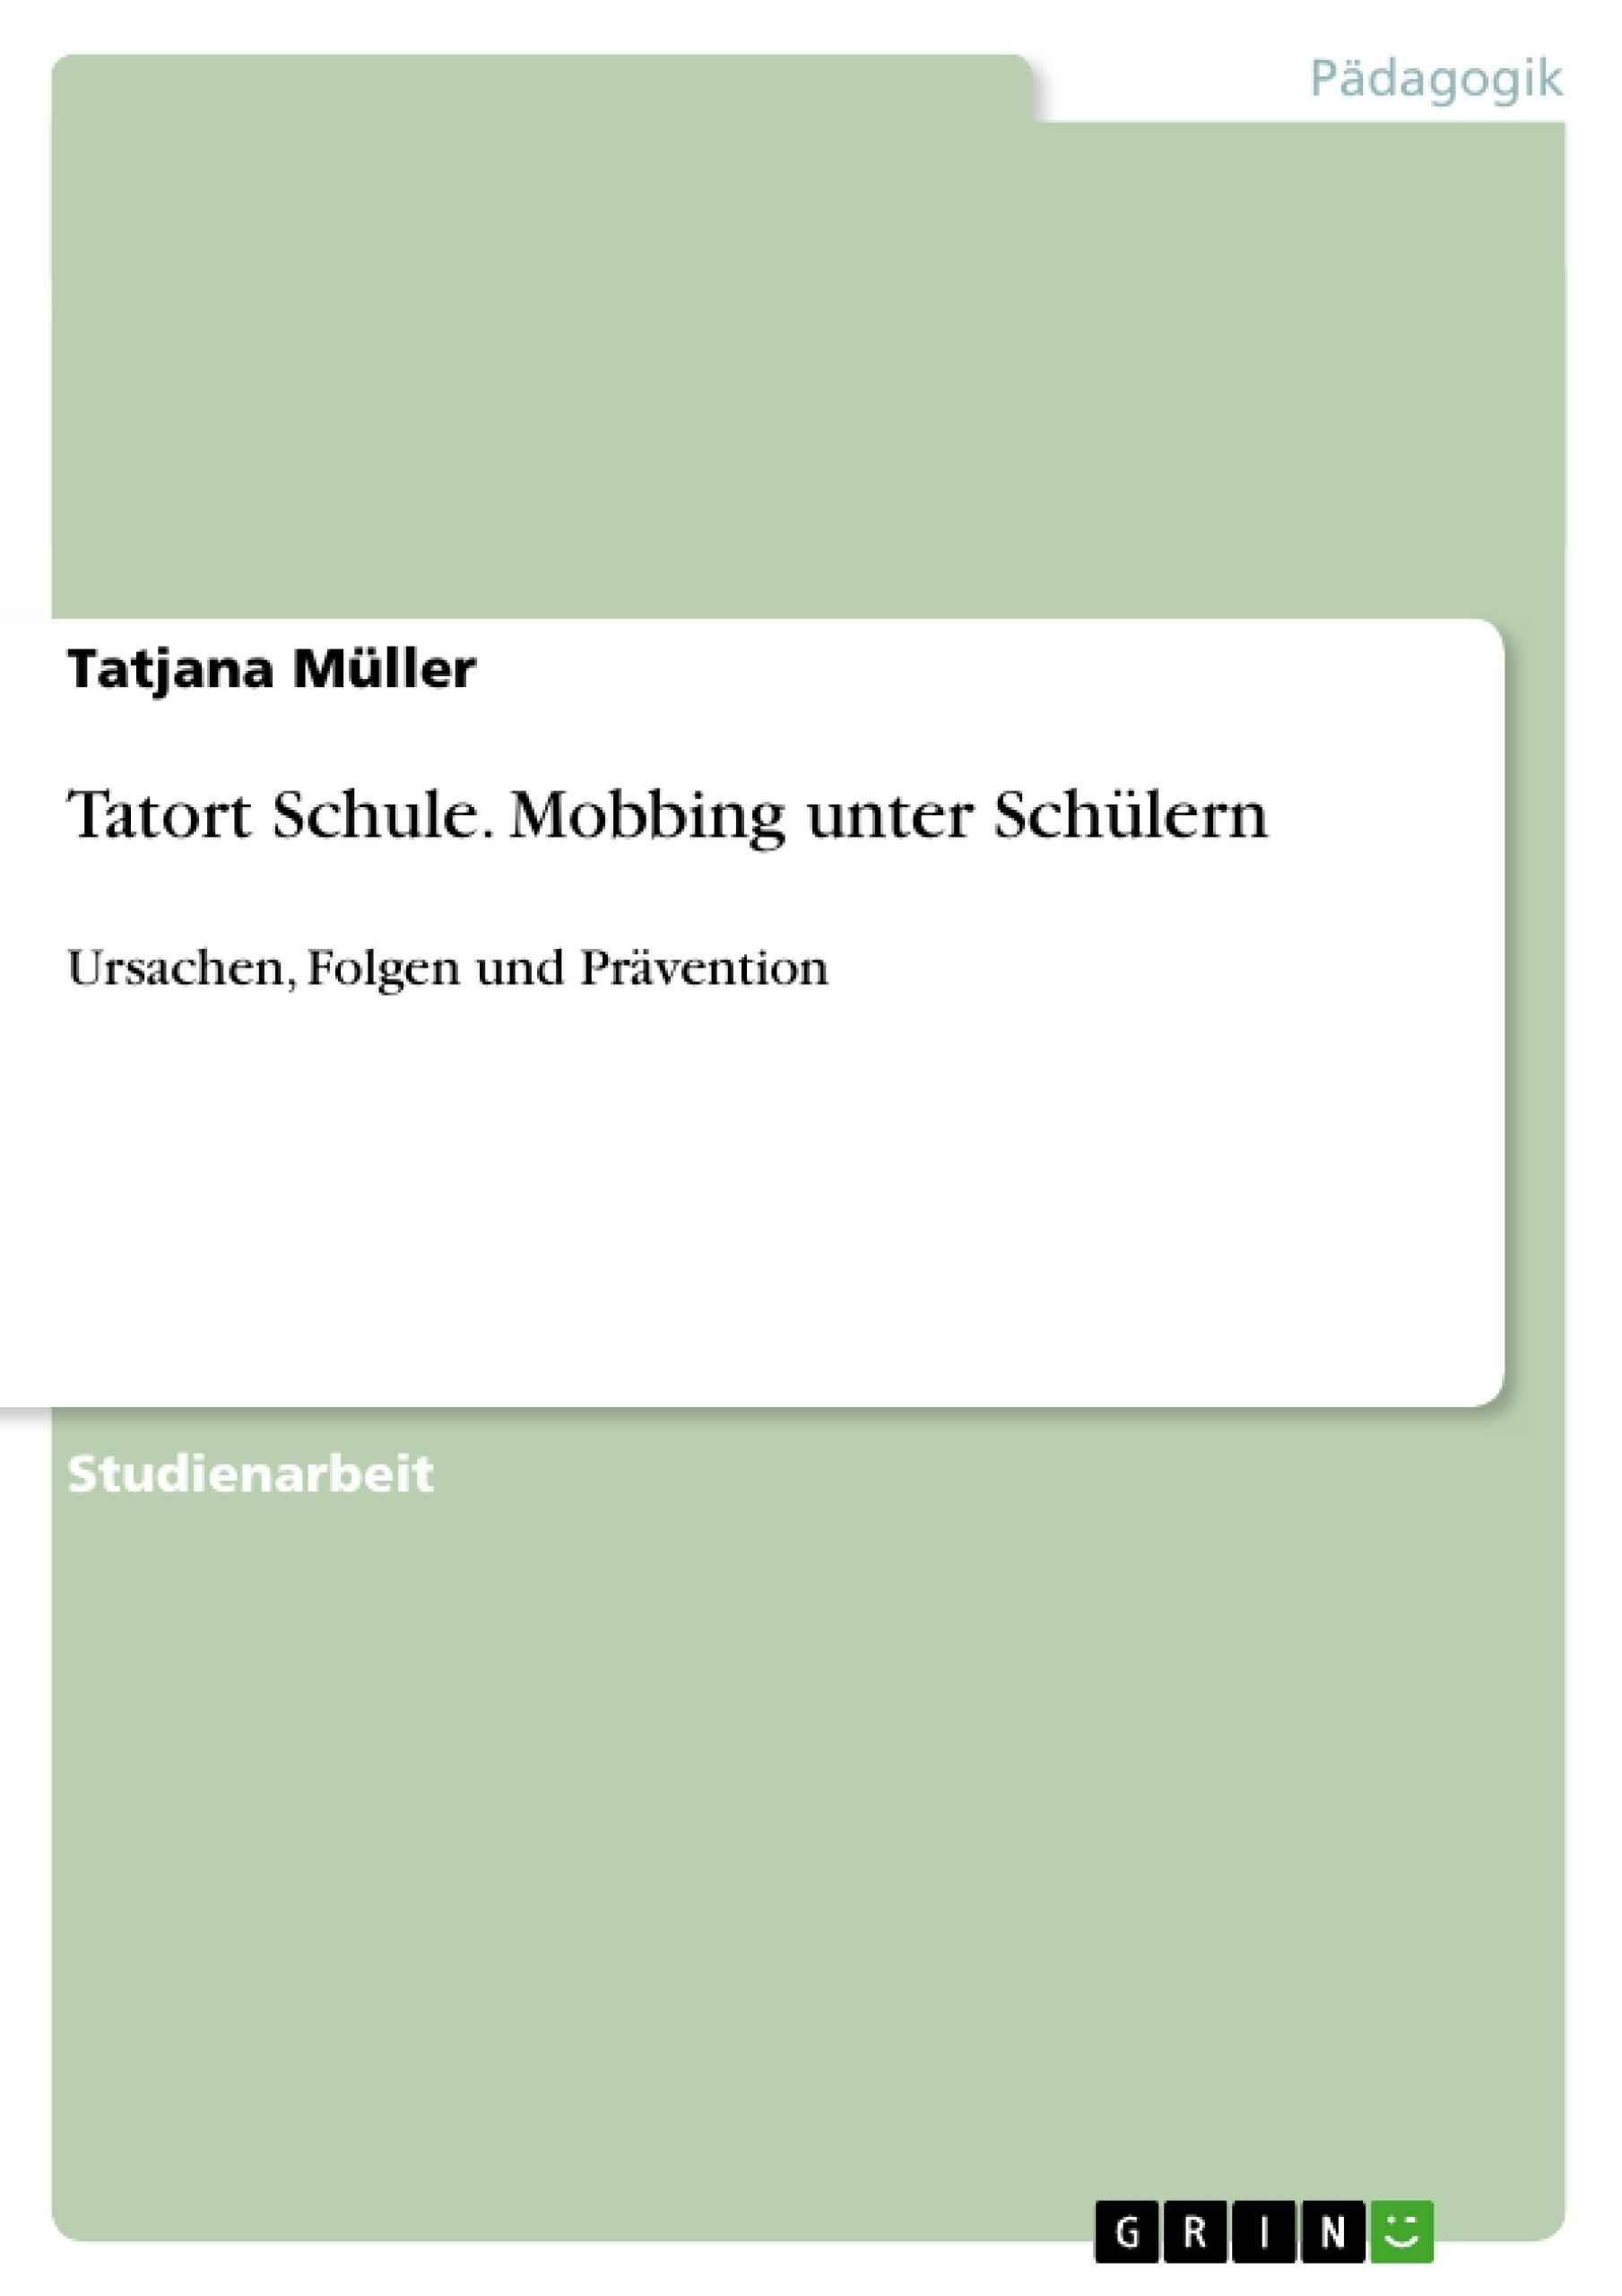 Titel: Tatort Schule. Mobbing unter Schülern